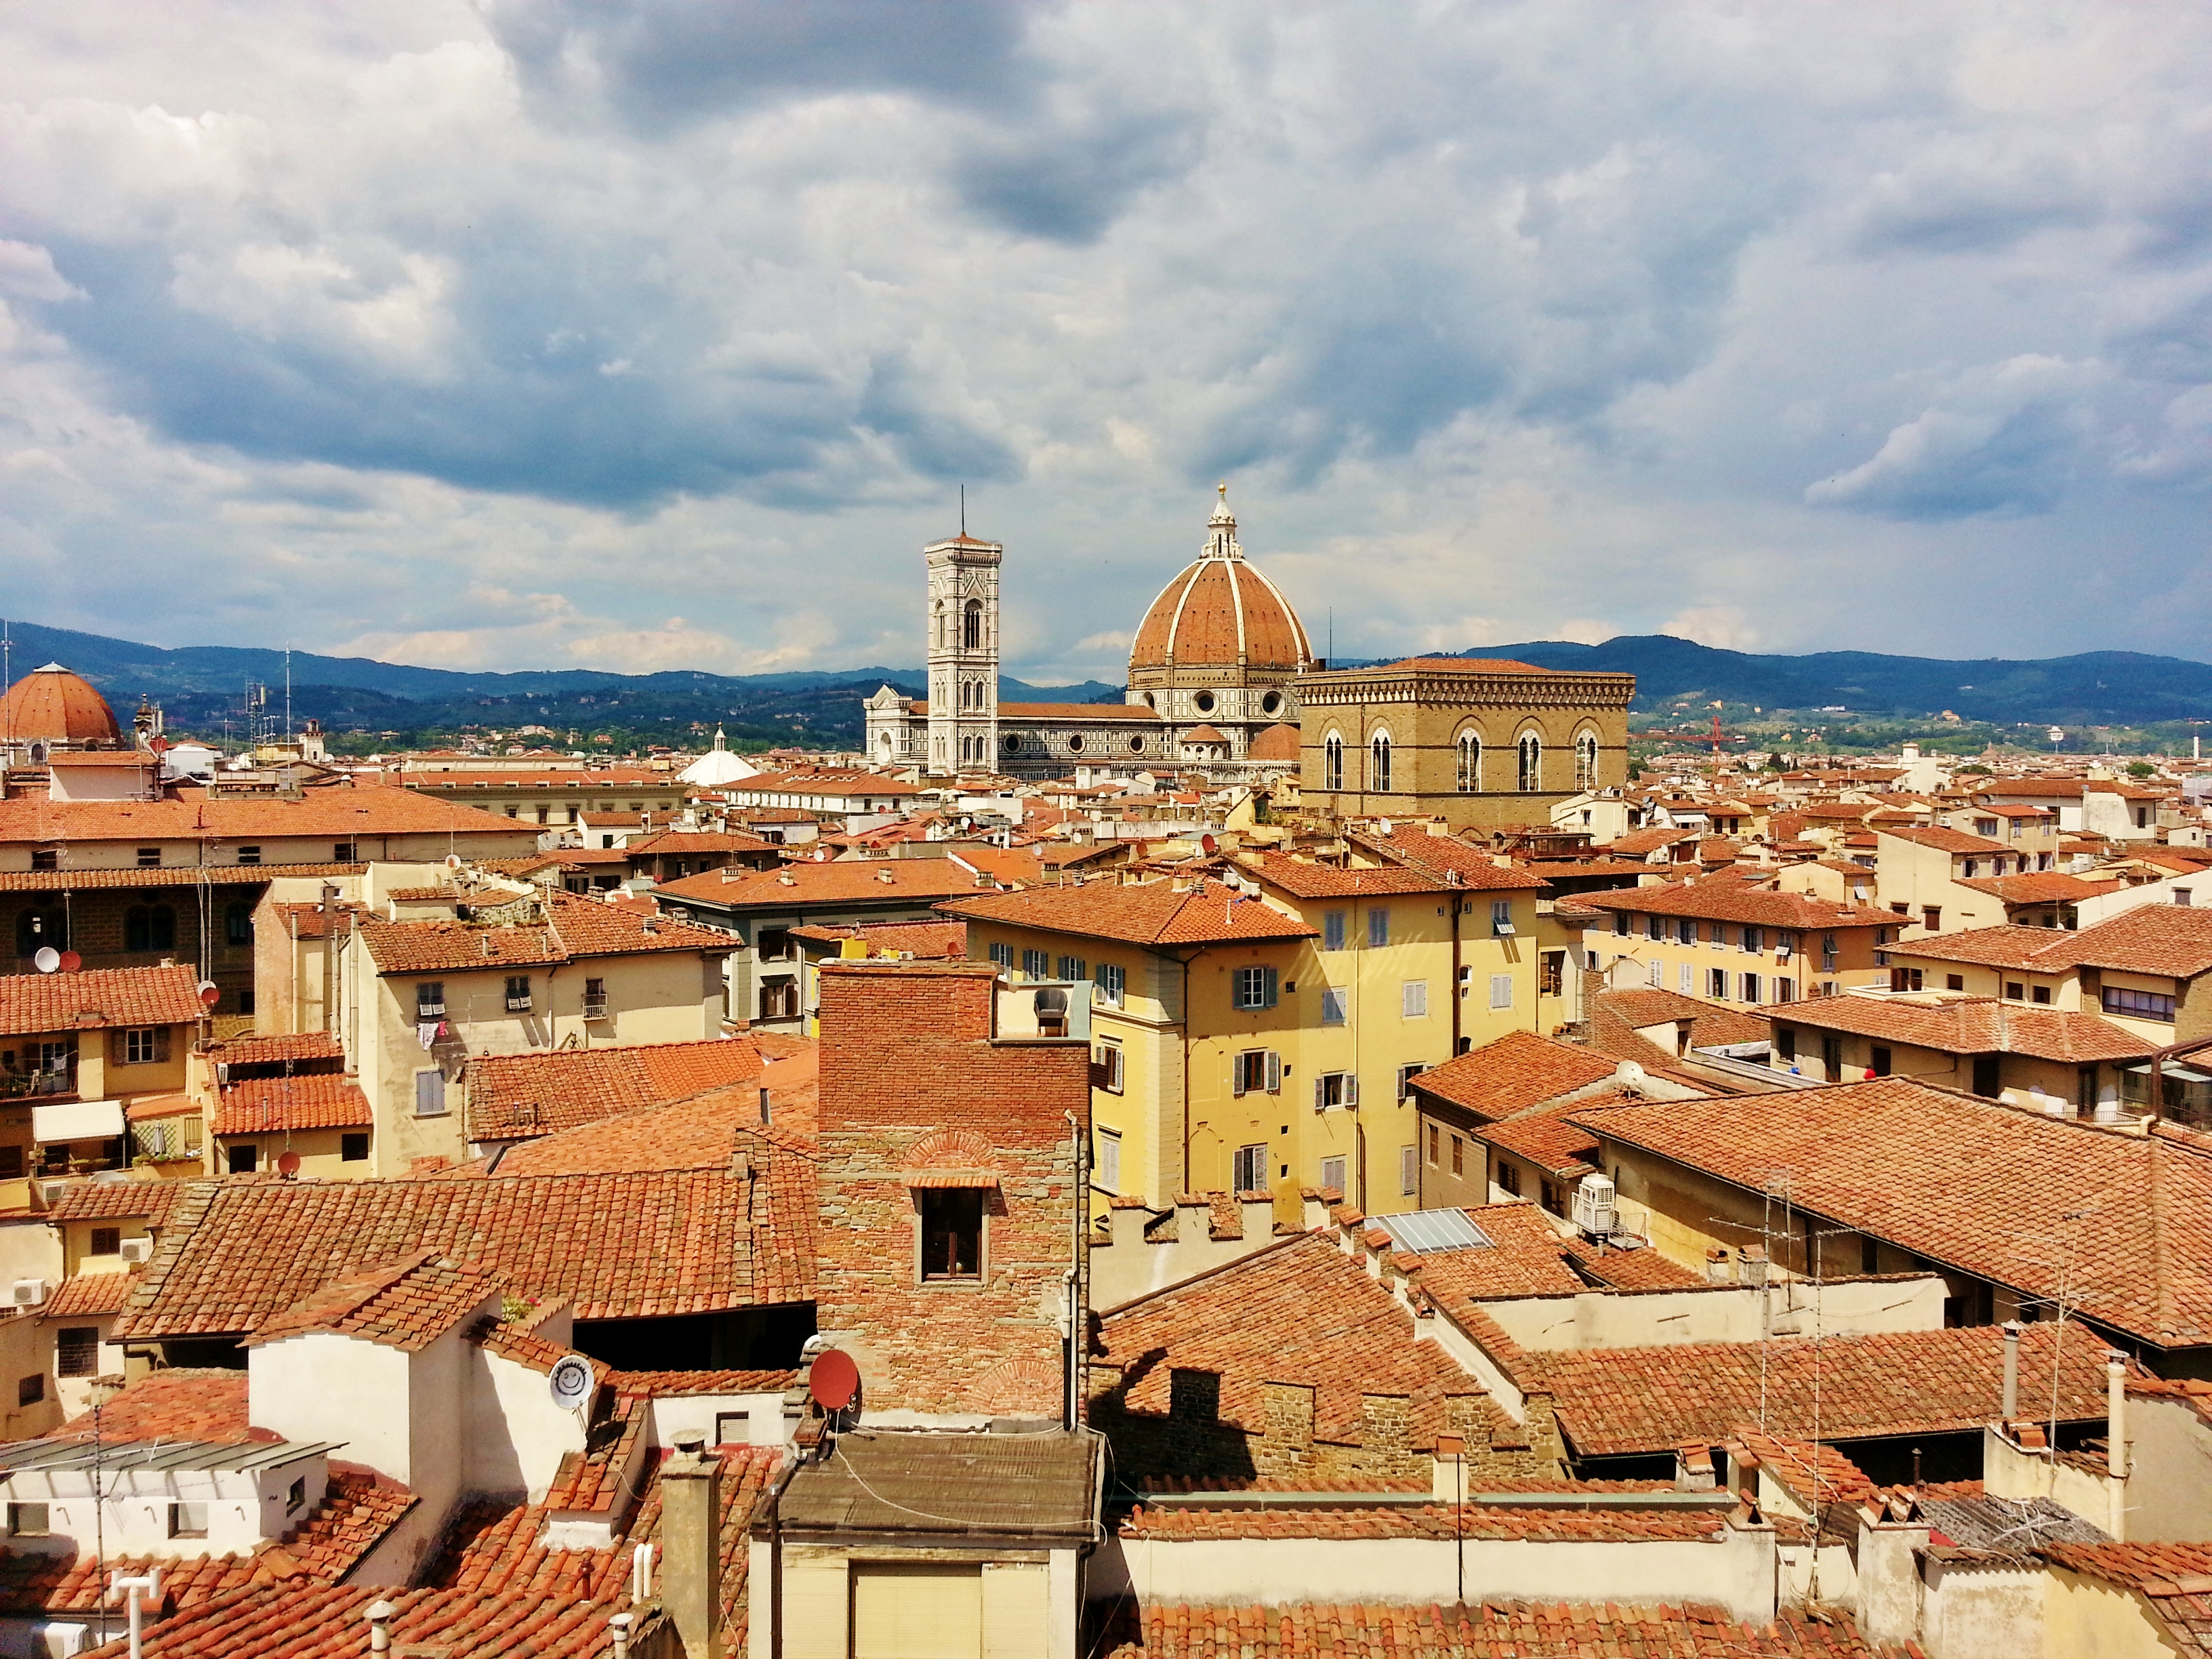 Duomo_florence